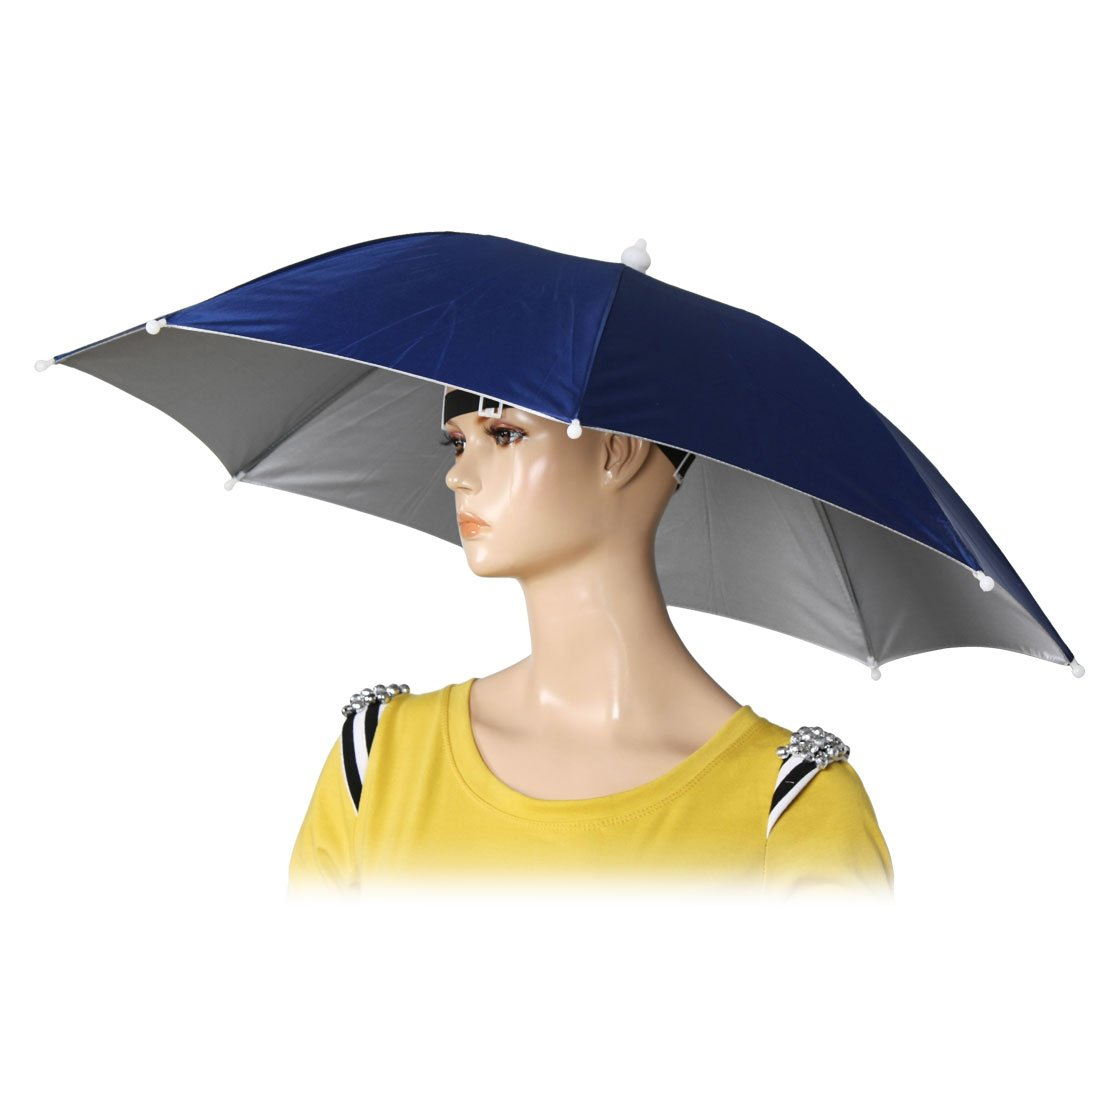 "Super sell 26"" Diameter Elastic Band Fishing Headwear Umbrella Hat Dark Blue"